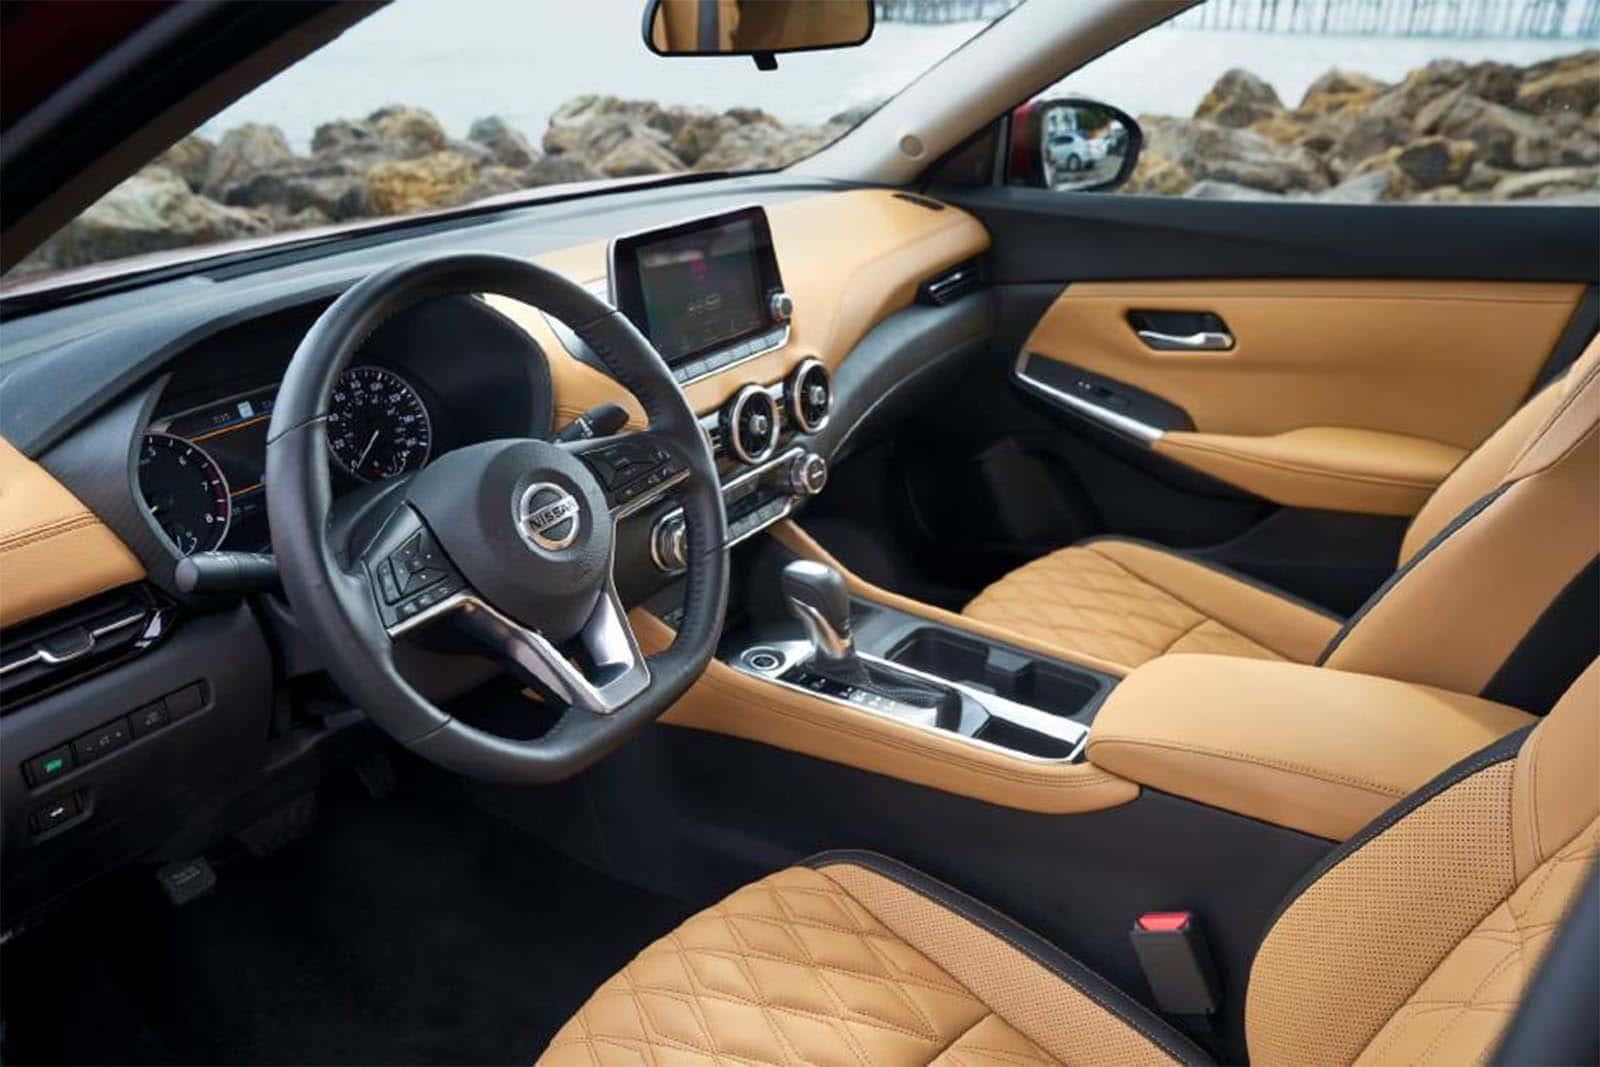 First Drive: 2020 Nissan Sentra | TheDetroitBureau.com